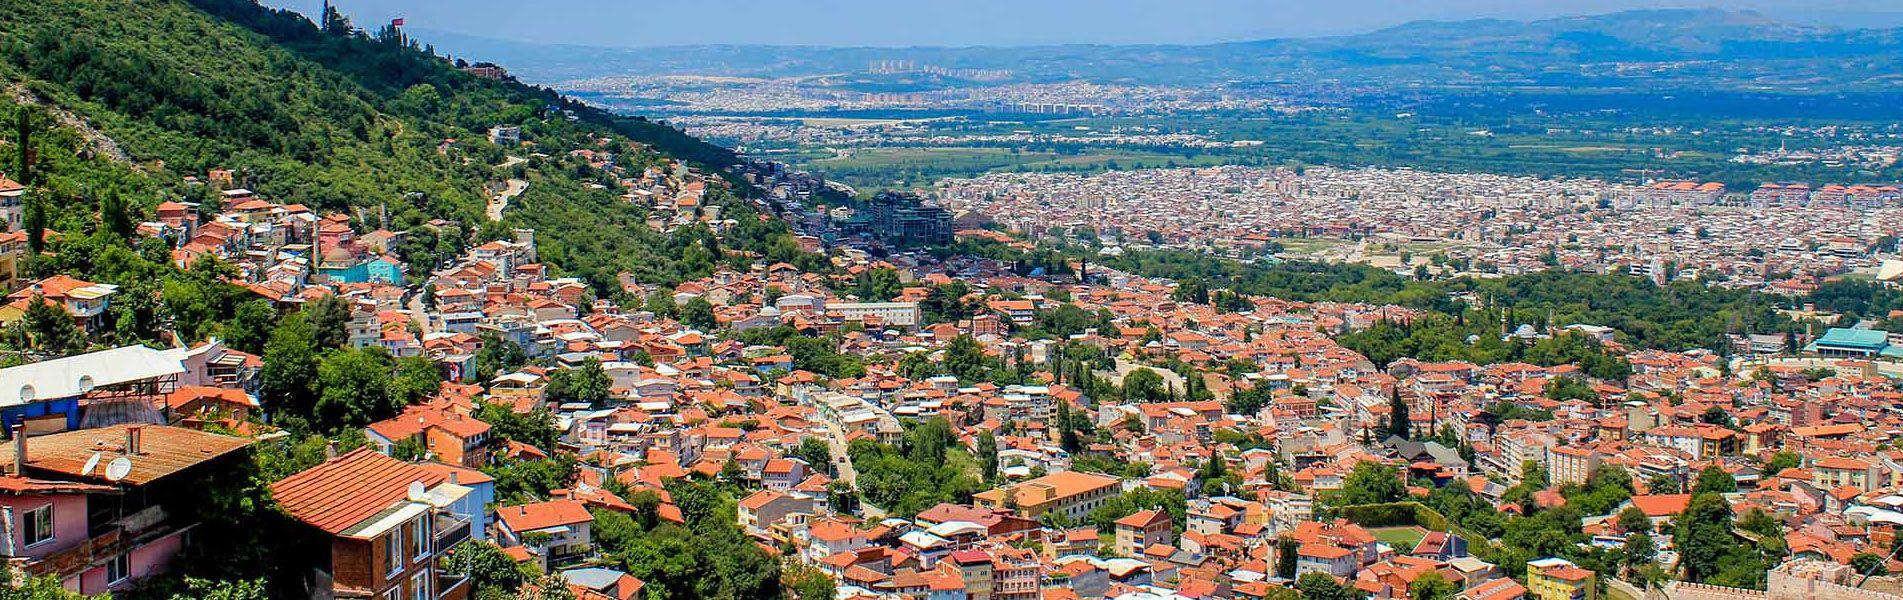 Bursa en Turquía